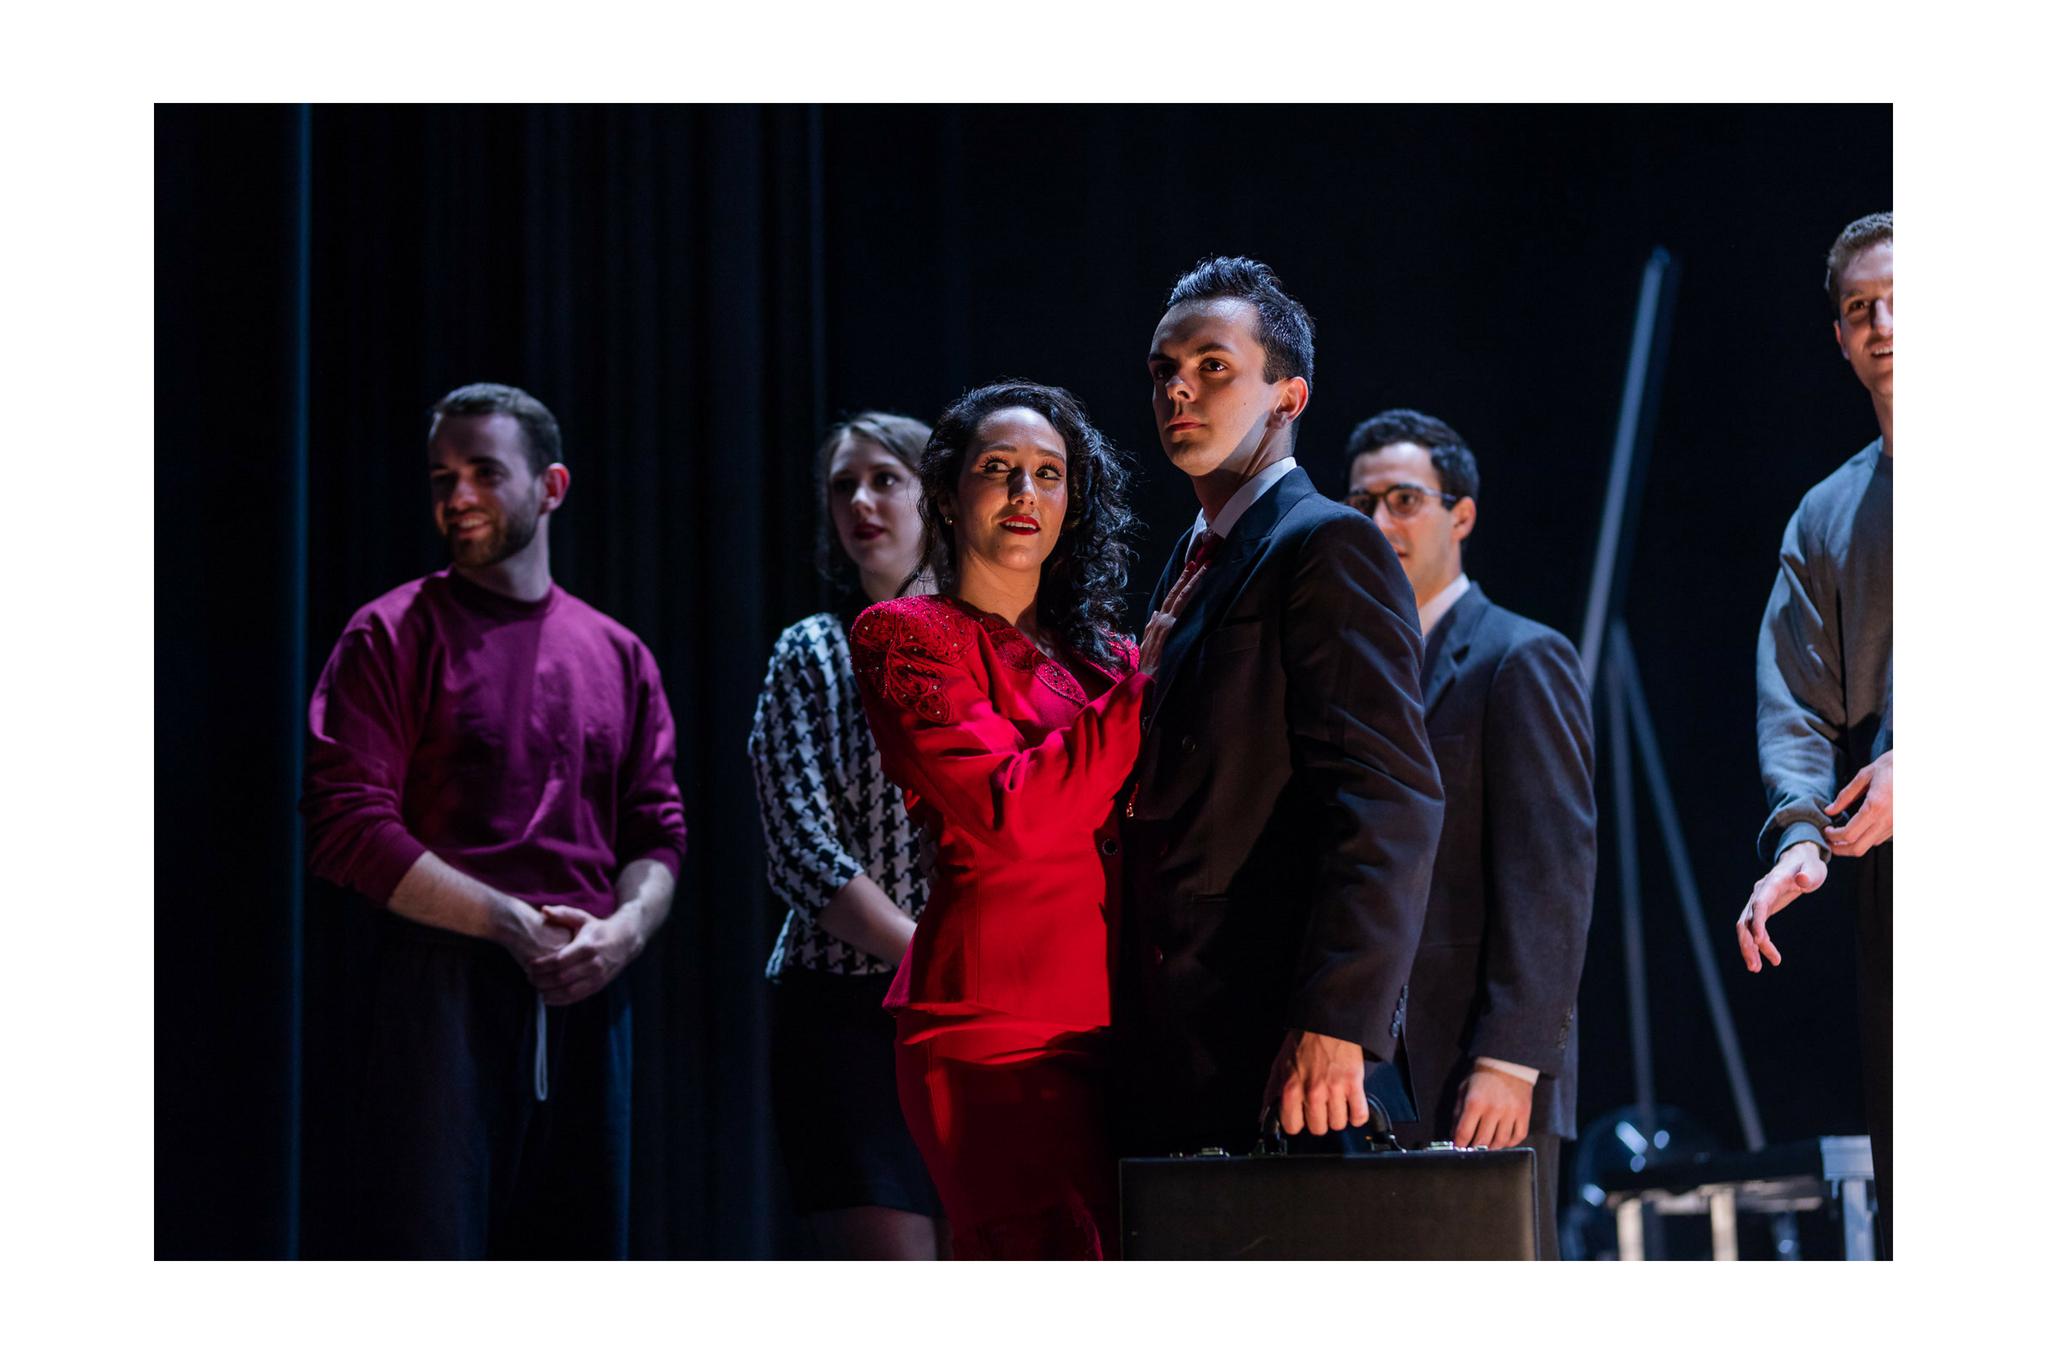 Kody Grasset (Lenox), Bailie de Lacy (Lady Macduff), Stefanie Resnick (Lady Macbeth), Billy Saunders, Jr. (Macbeth), Felix Teich (Donalbain), and Ross Barron (Ross) in Macbeth, CSC2, 2018-Photo by Nile Hawver